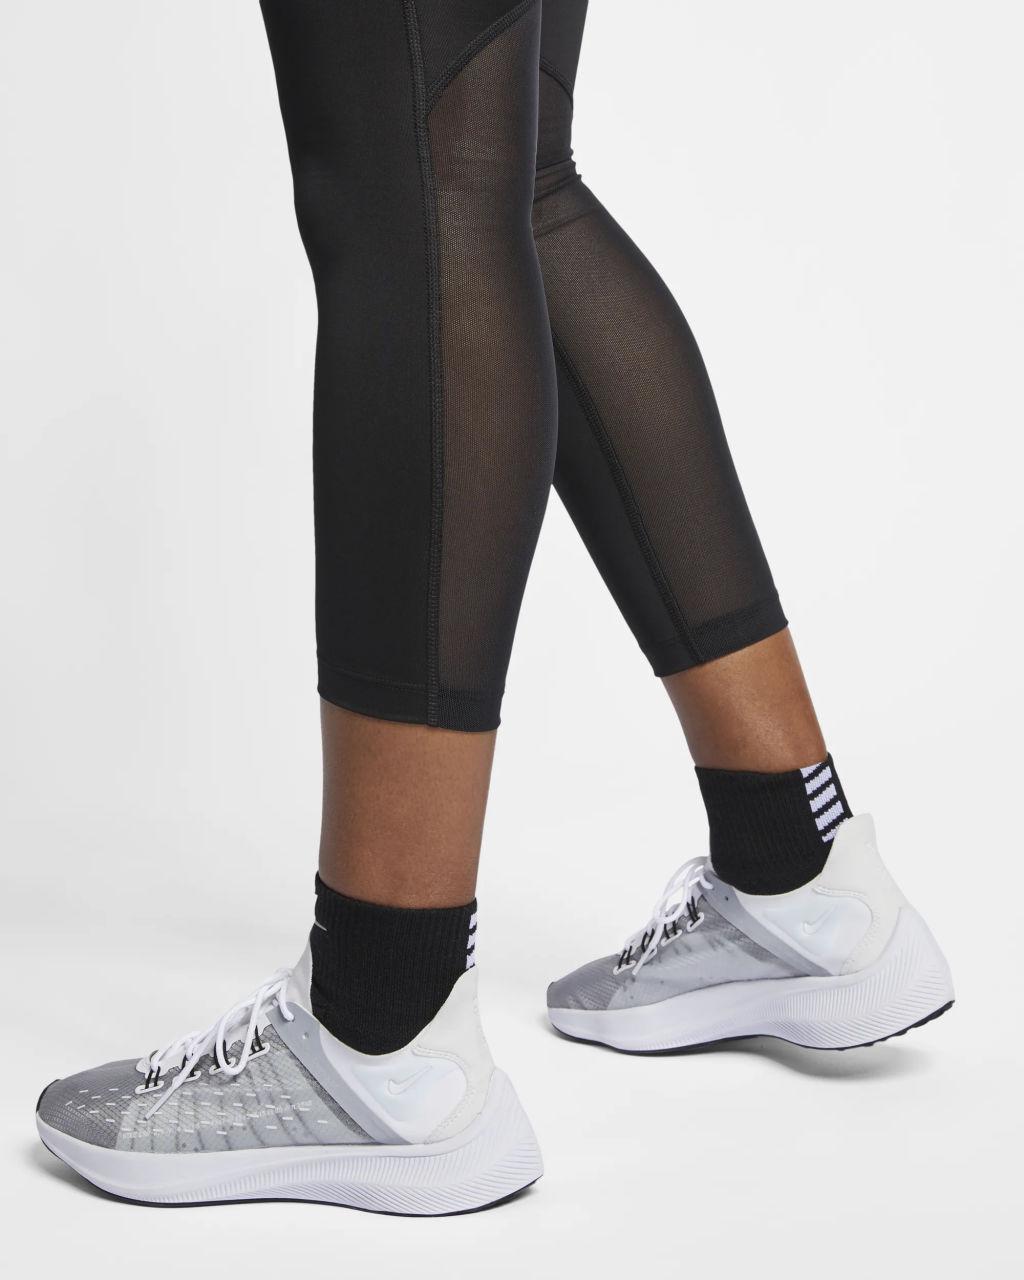 976bfacf Nike Fast Crop 3/4 Running Tight W - Naisten 3/4 trikoot